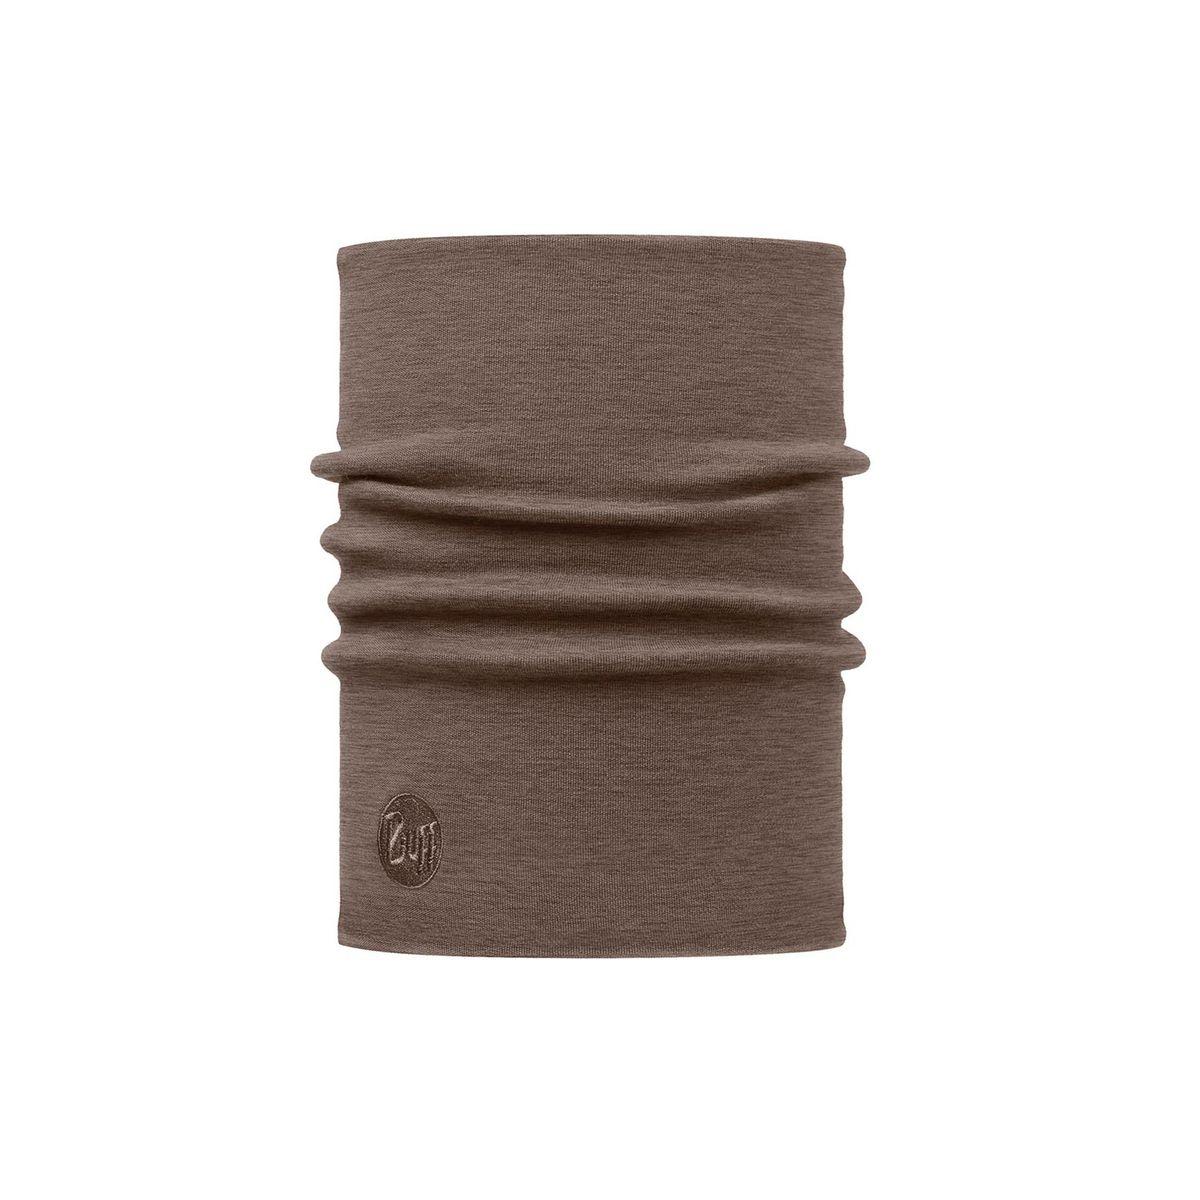 Heavyweight Merino Wool - Foulard - marron